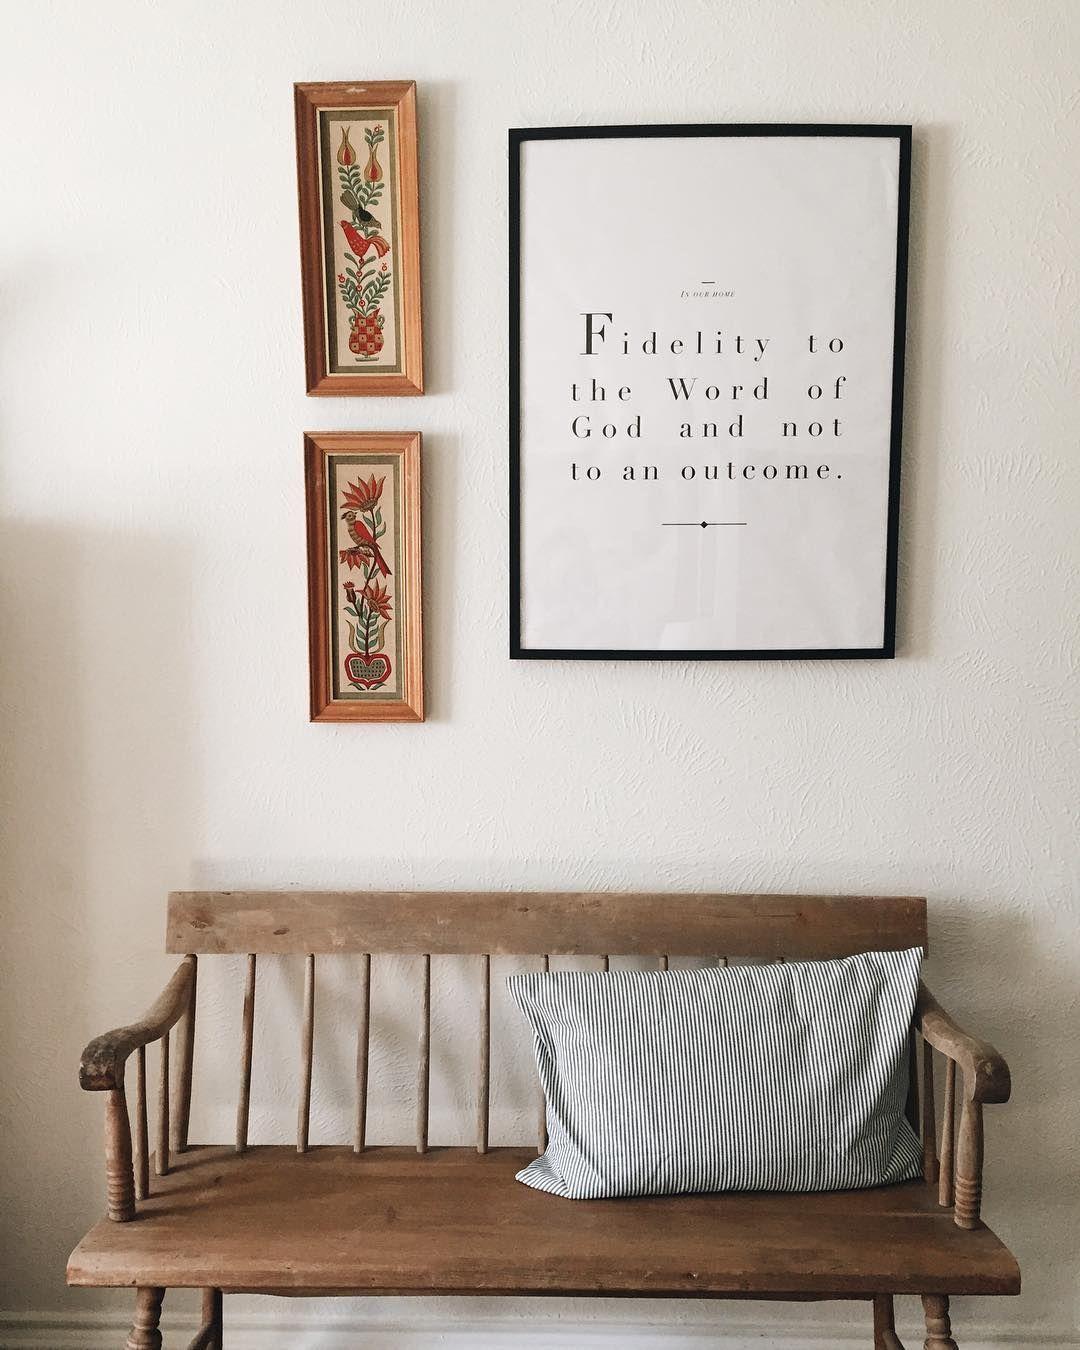 Foyer House Insurance : Pin by briana maxwell on d w e l i n g pinterest